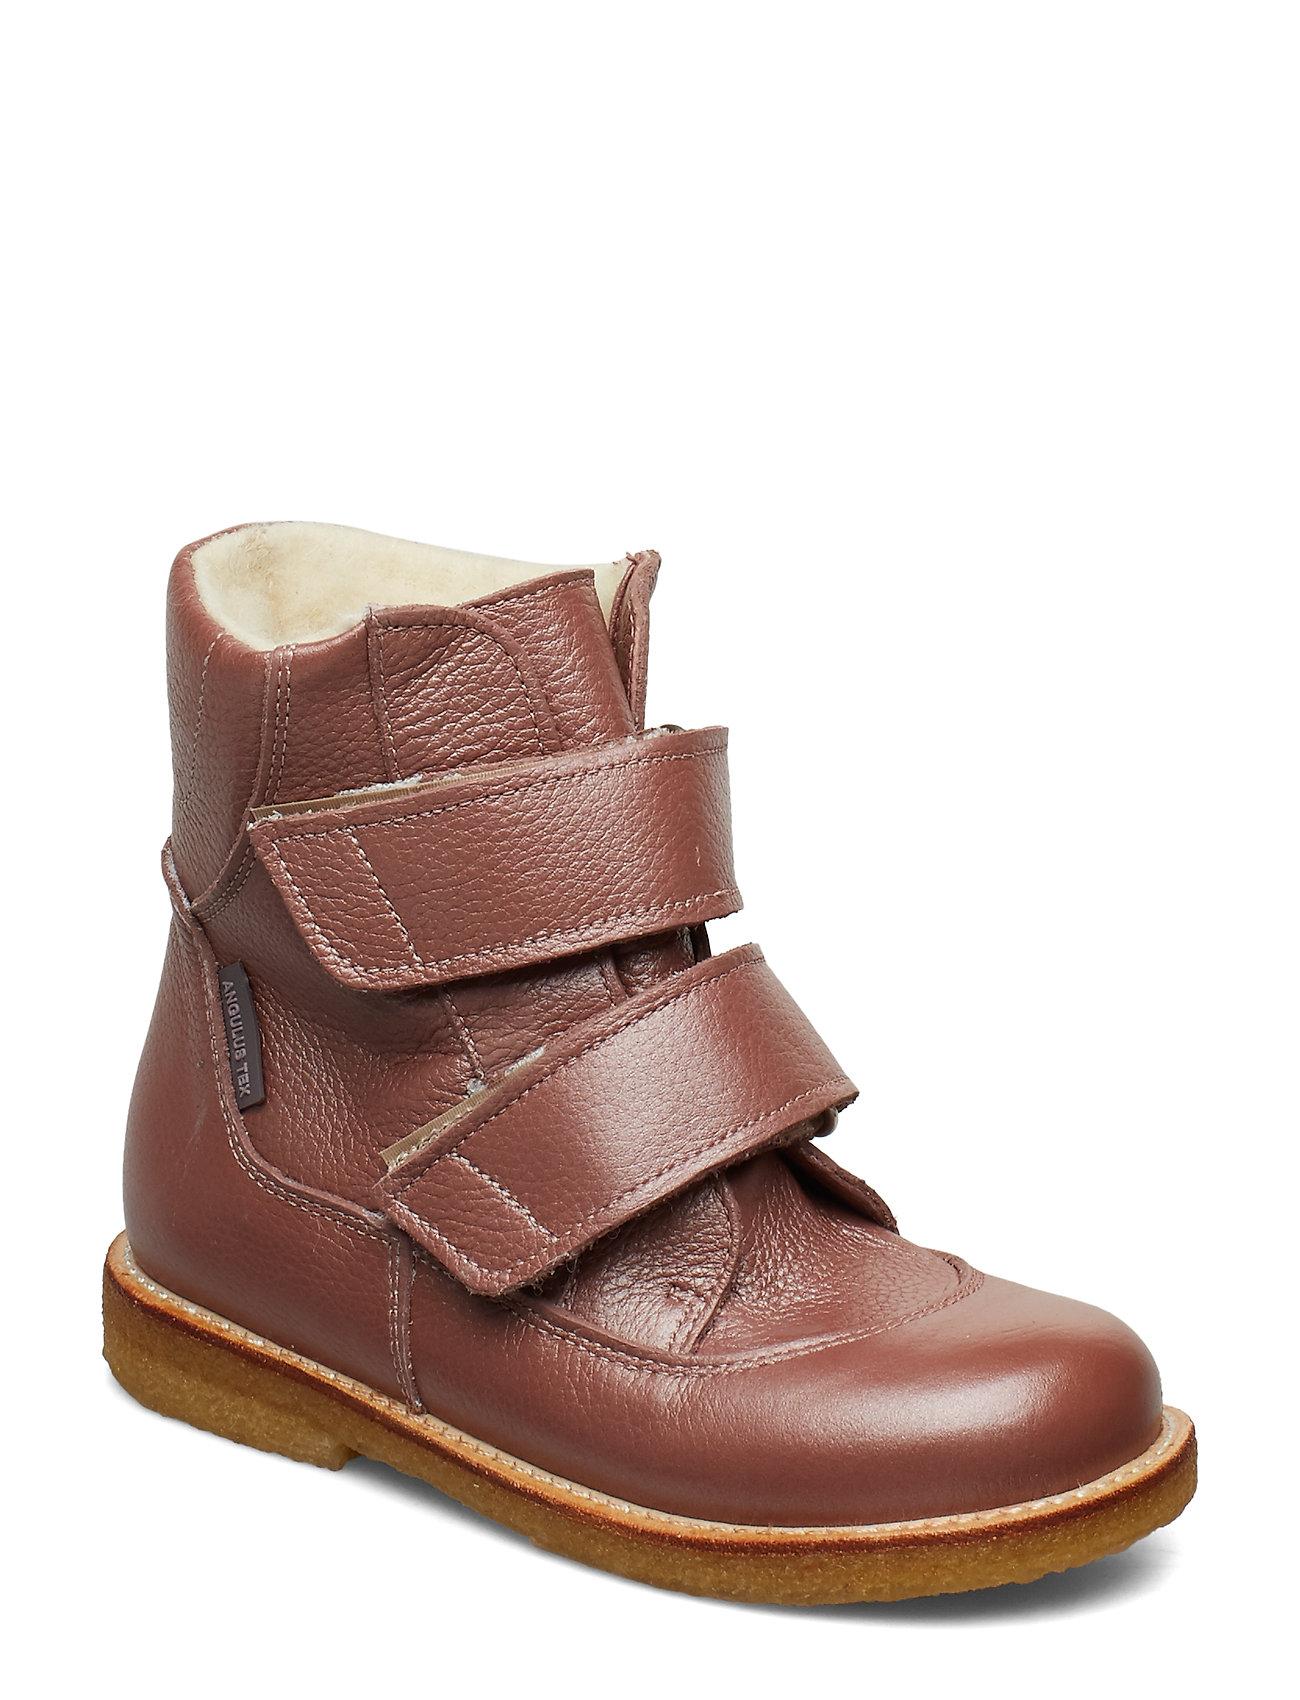 ANGULUS Boots - flat - with velcro - 2636 ROSE SHINE